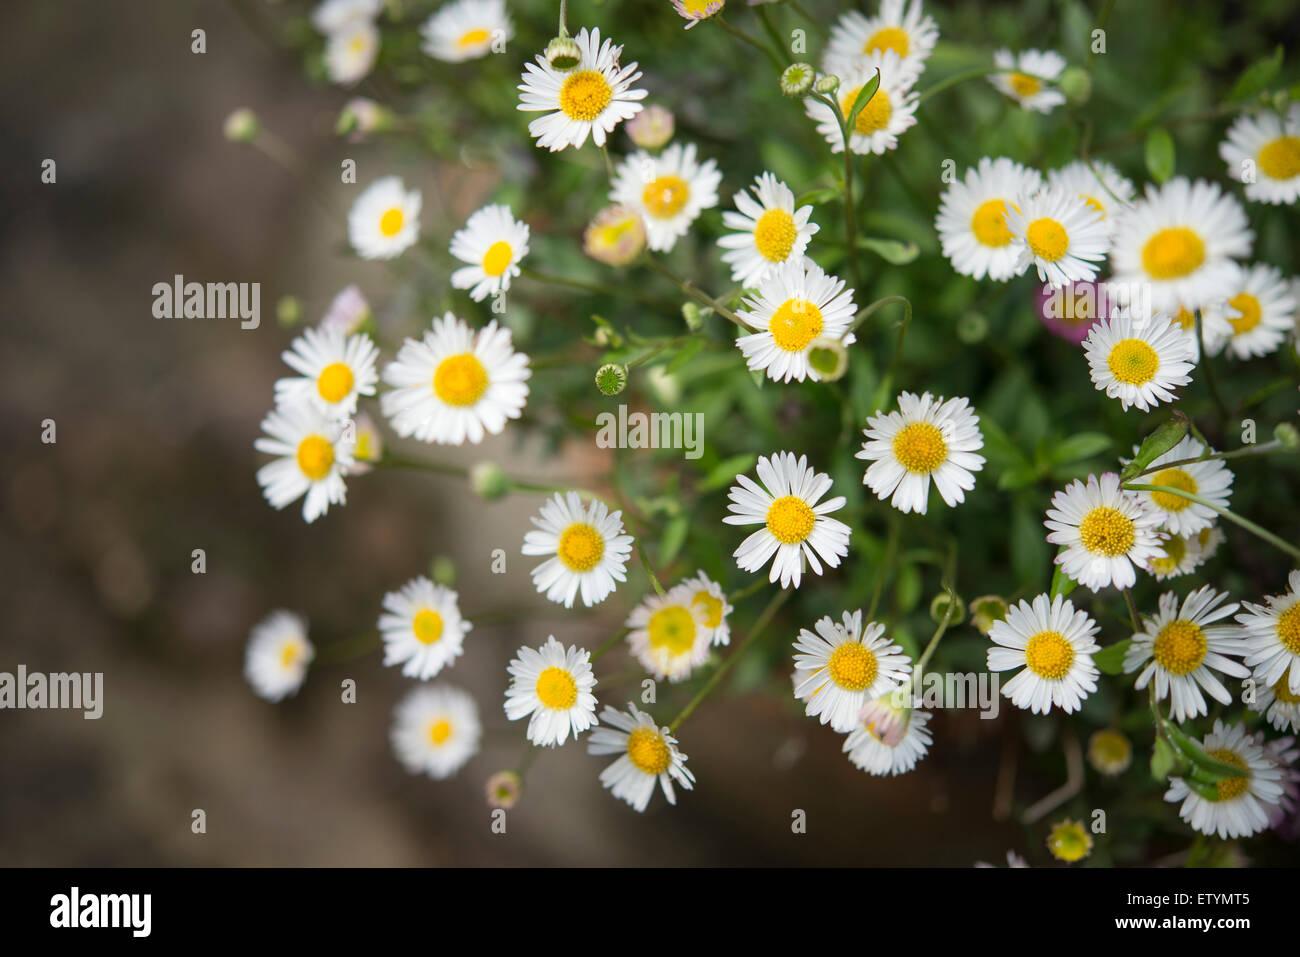 Erigeron Karvinskianus With Tiny Daisy Like Flowers Flowering In